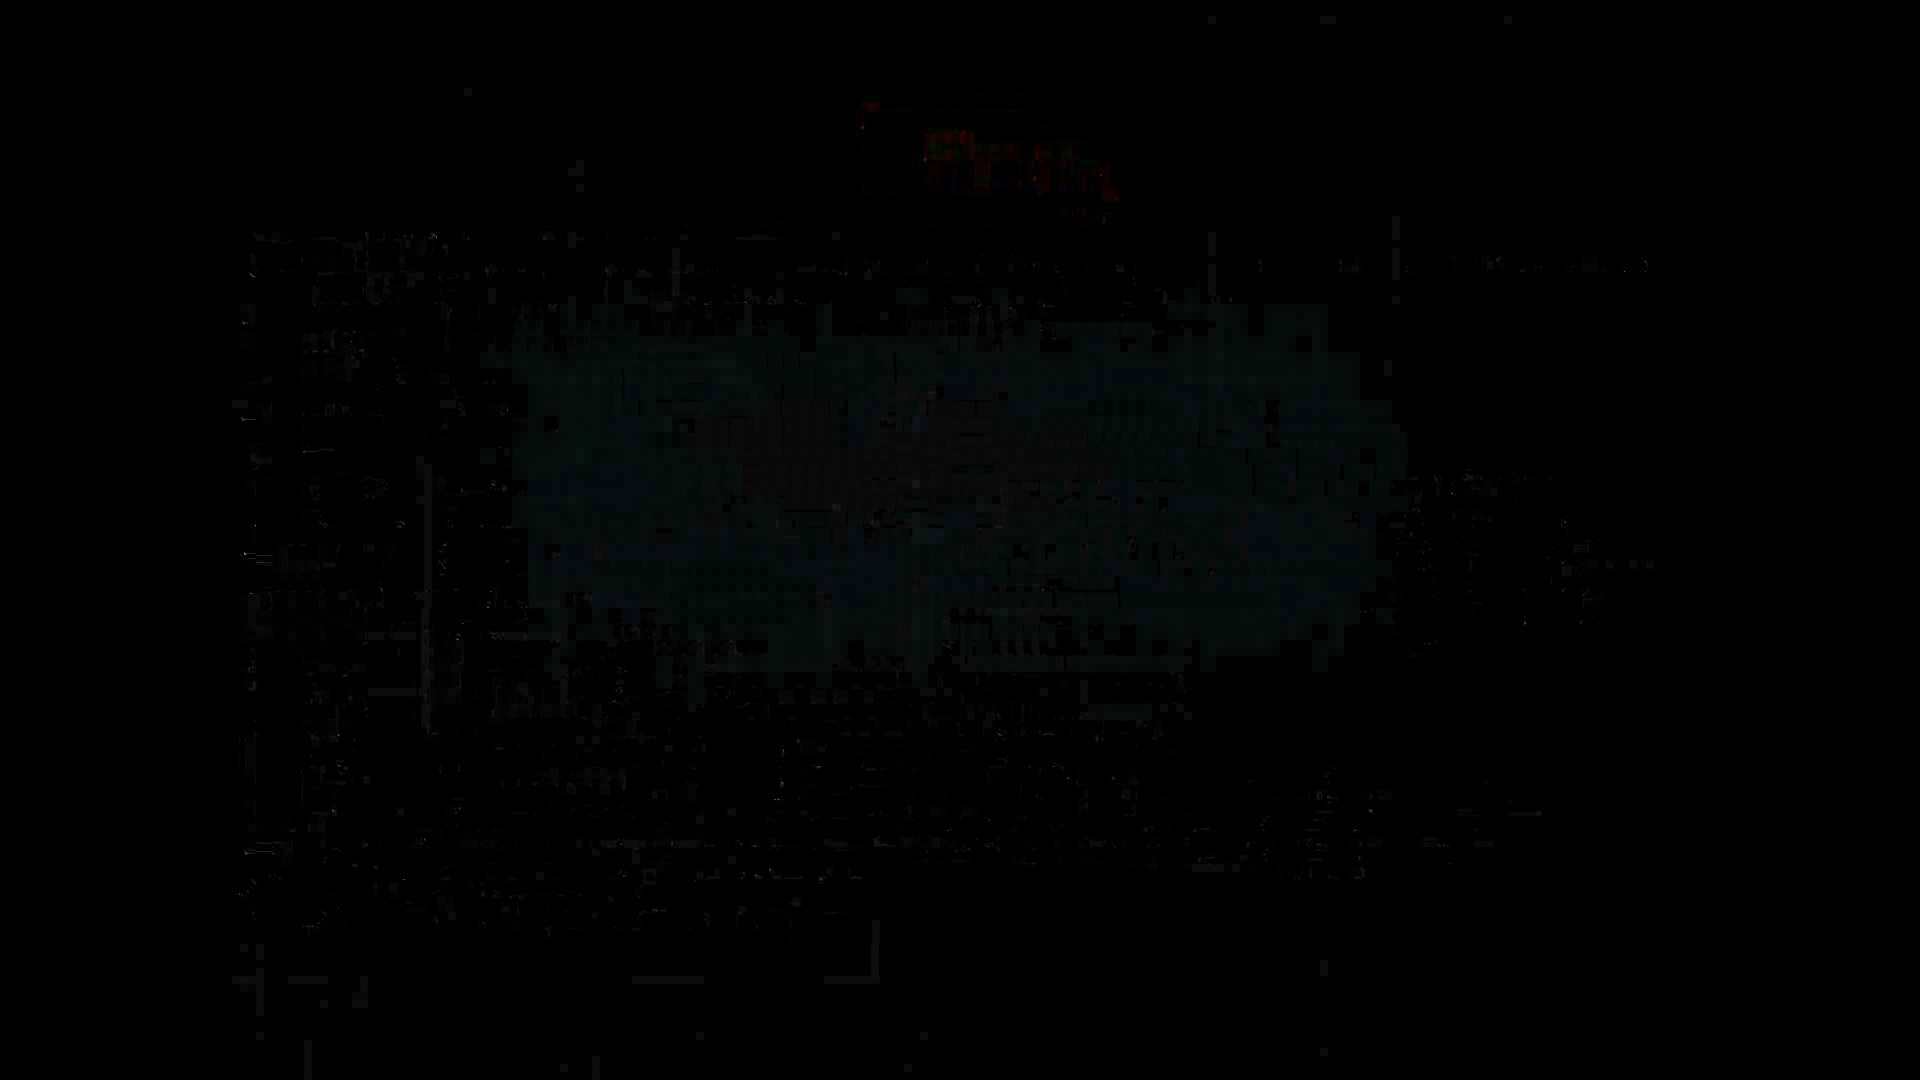 Aquaな露天風呂Vol.867潜入盗撮露天風呂参判湯 其の六 OLすけべ画像 オメコ無修正動画無料 96連発 2